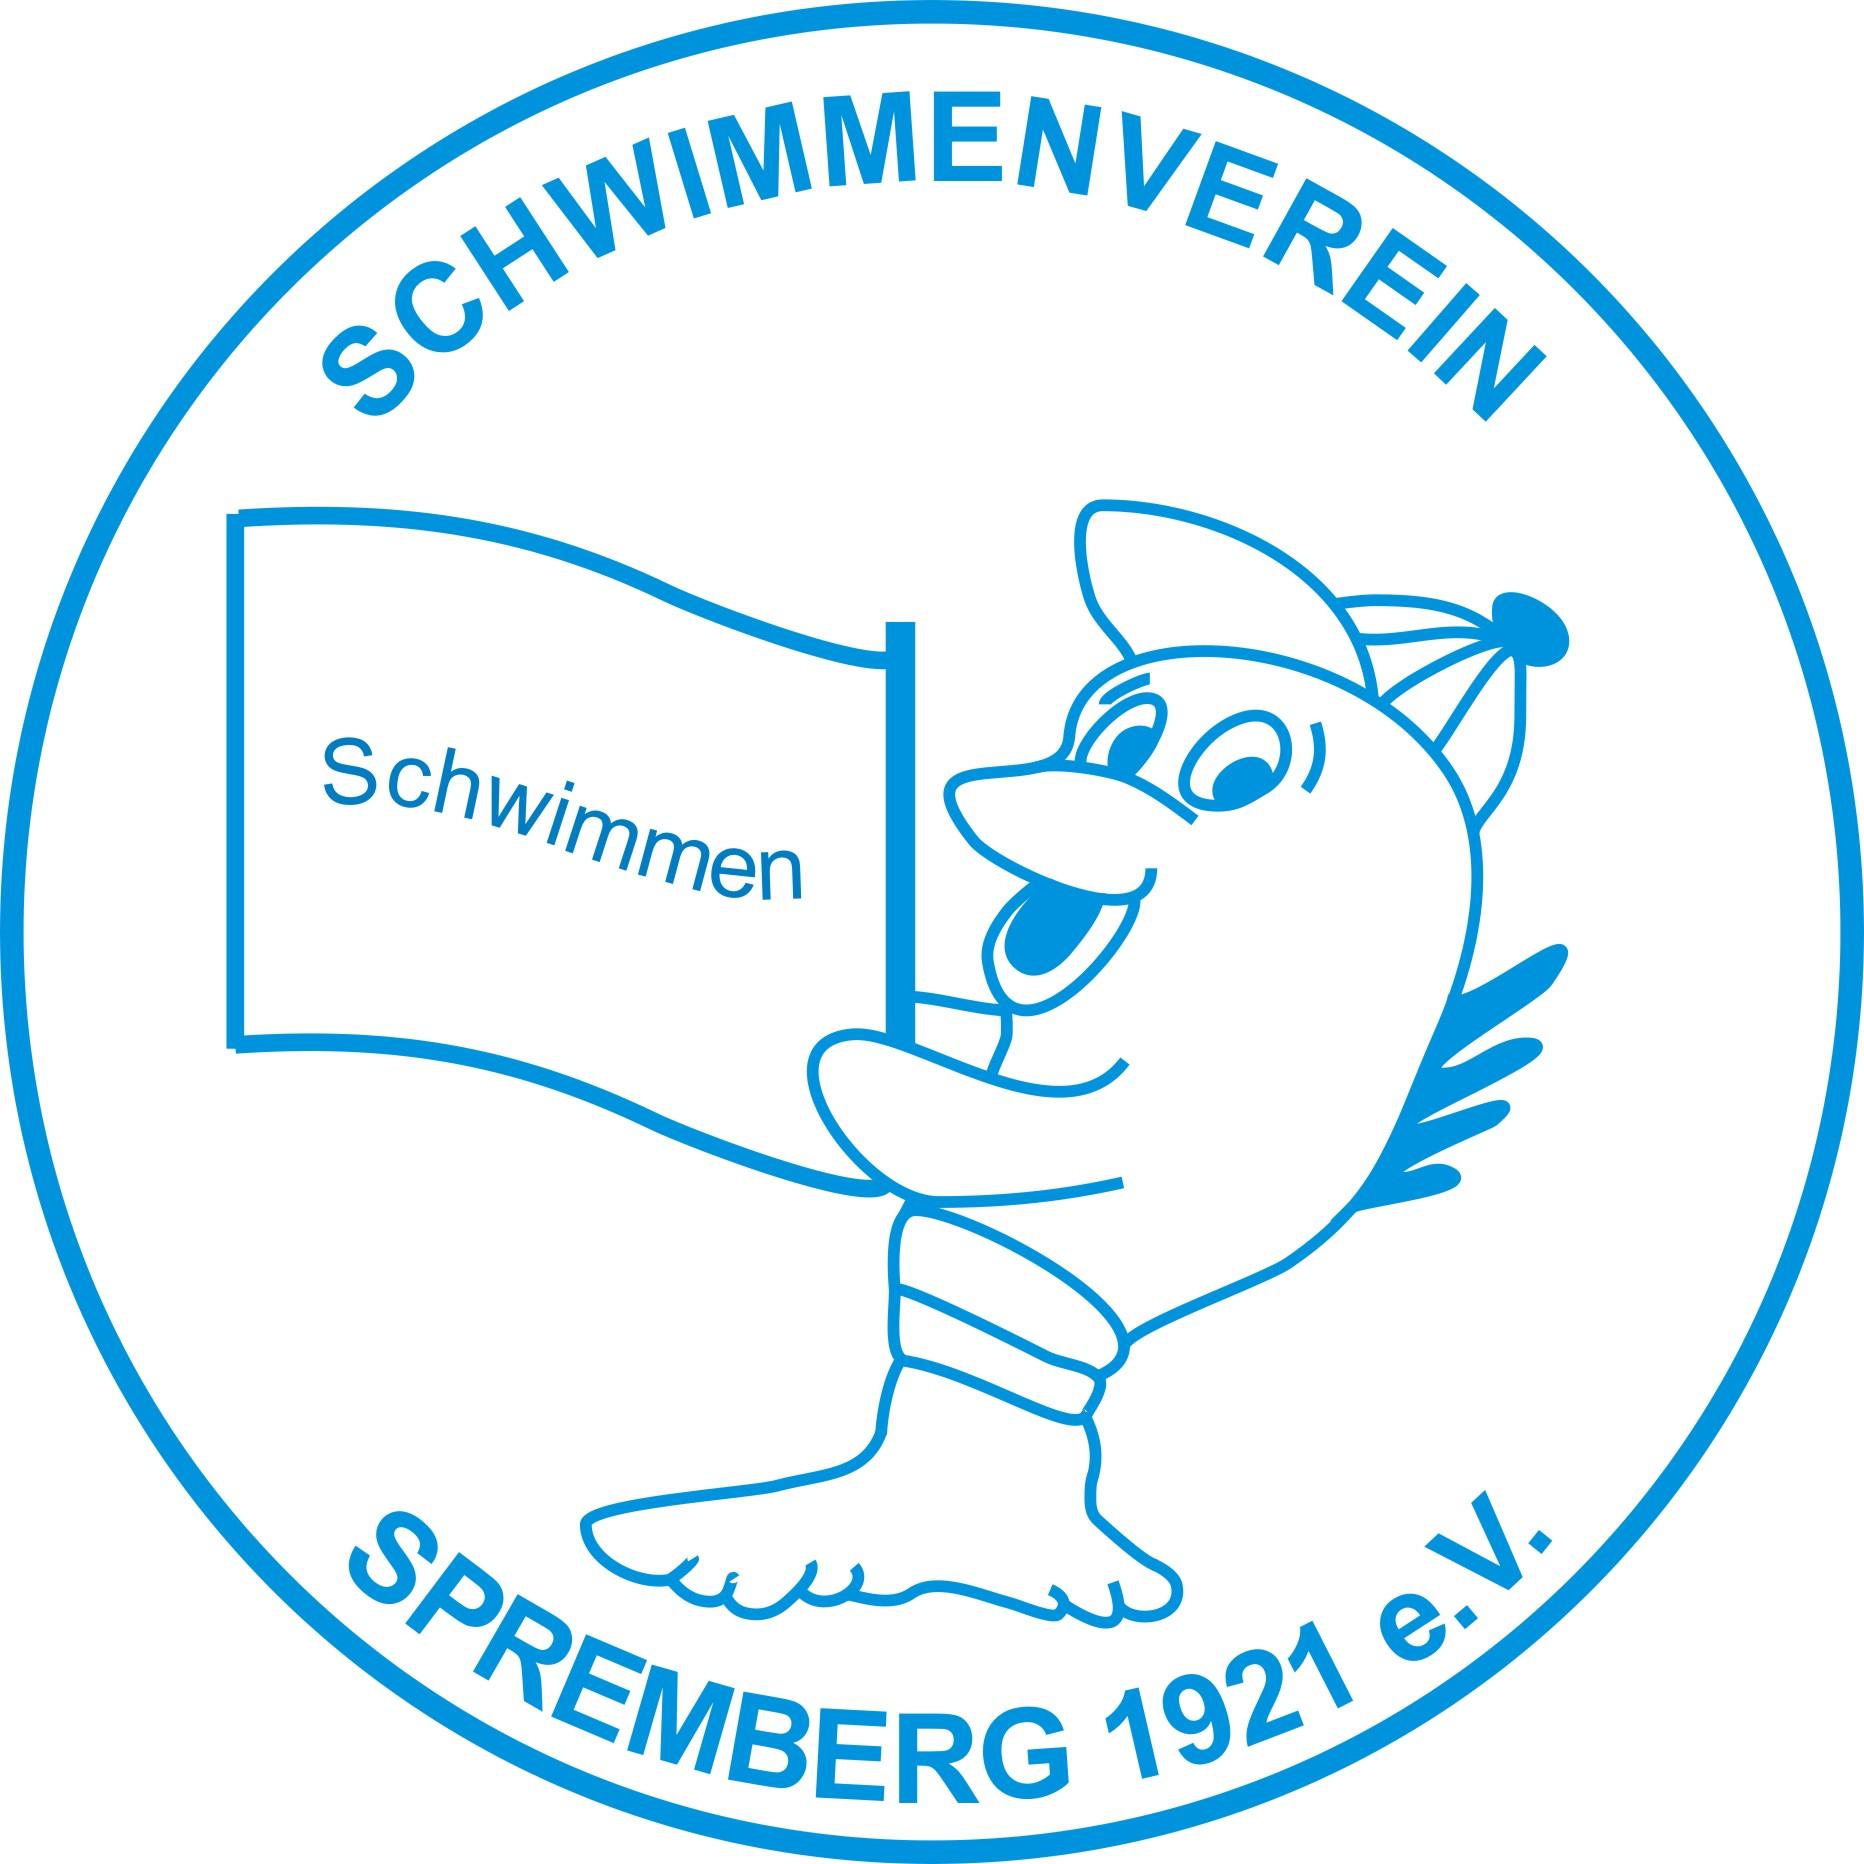 Schwimmverein Spremberg 1921 e.V.